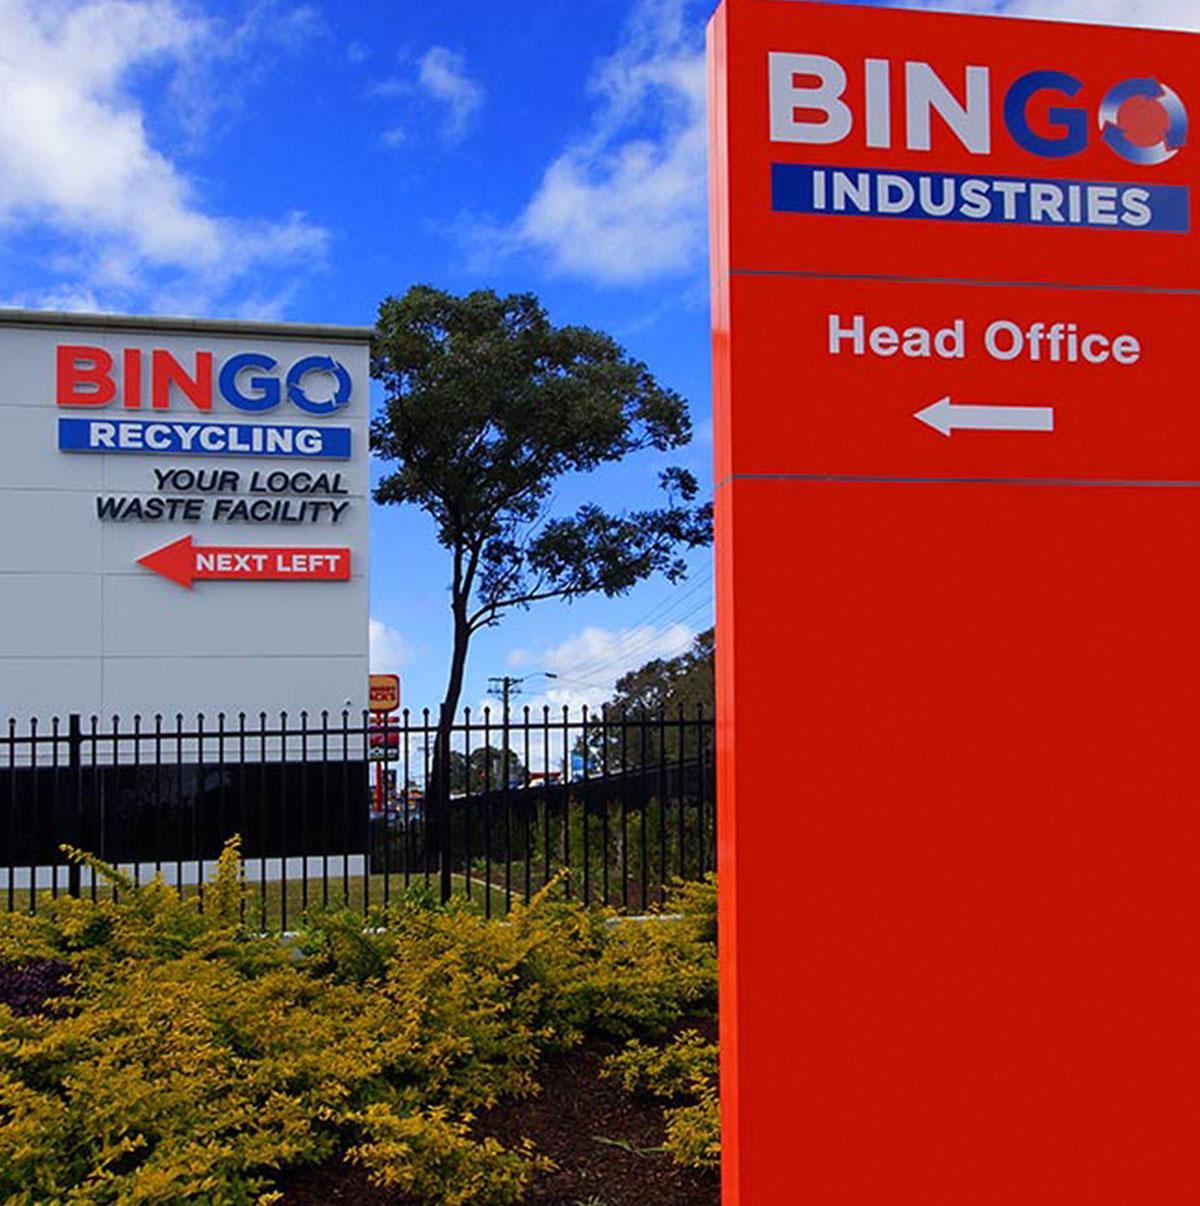 Our Creation - Bingo Industries